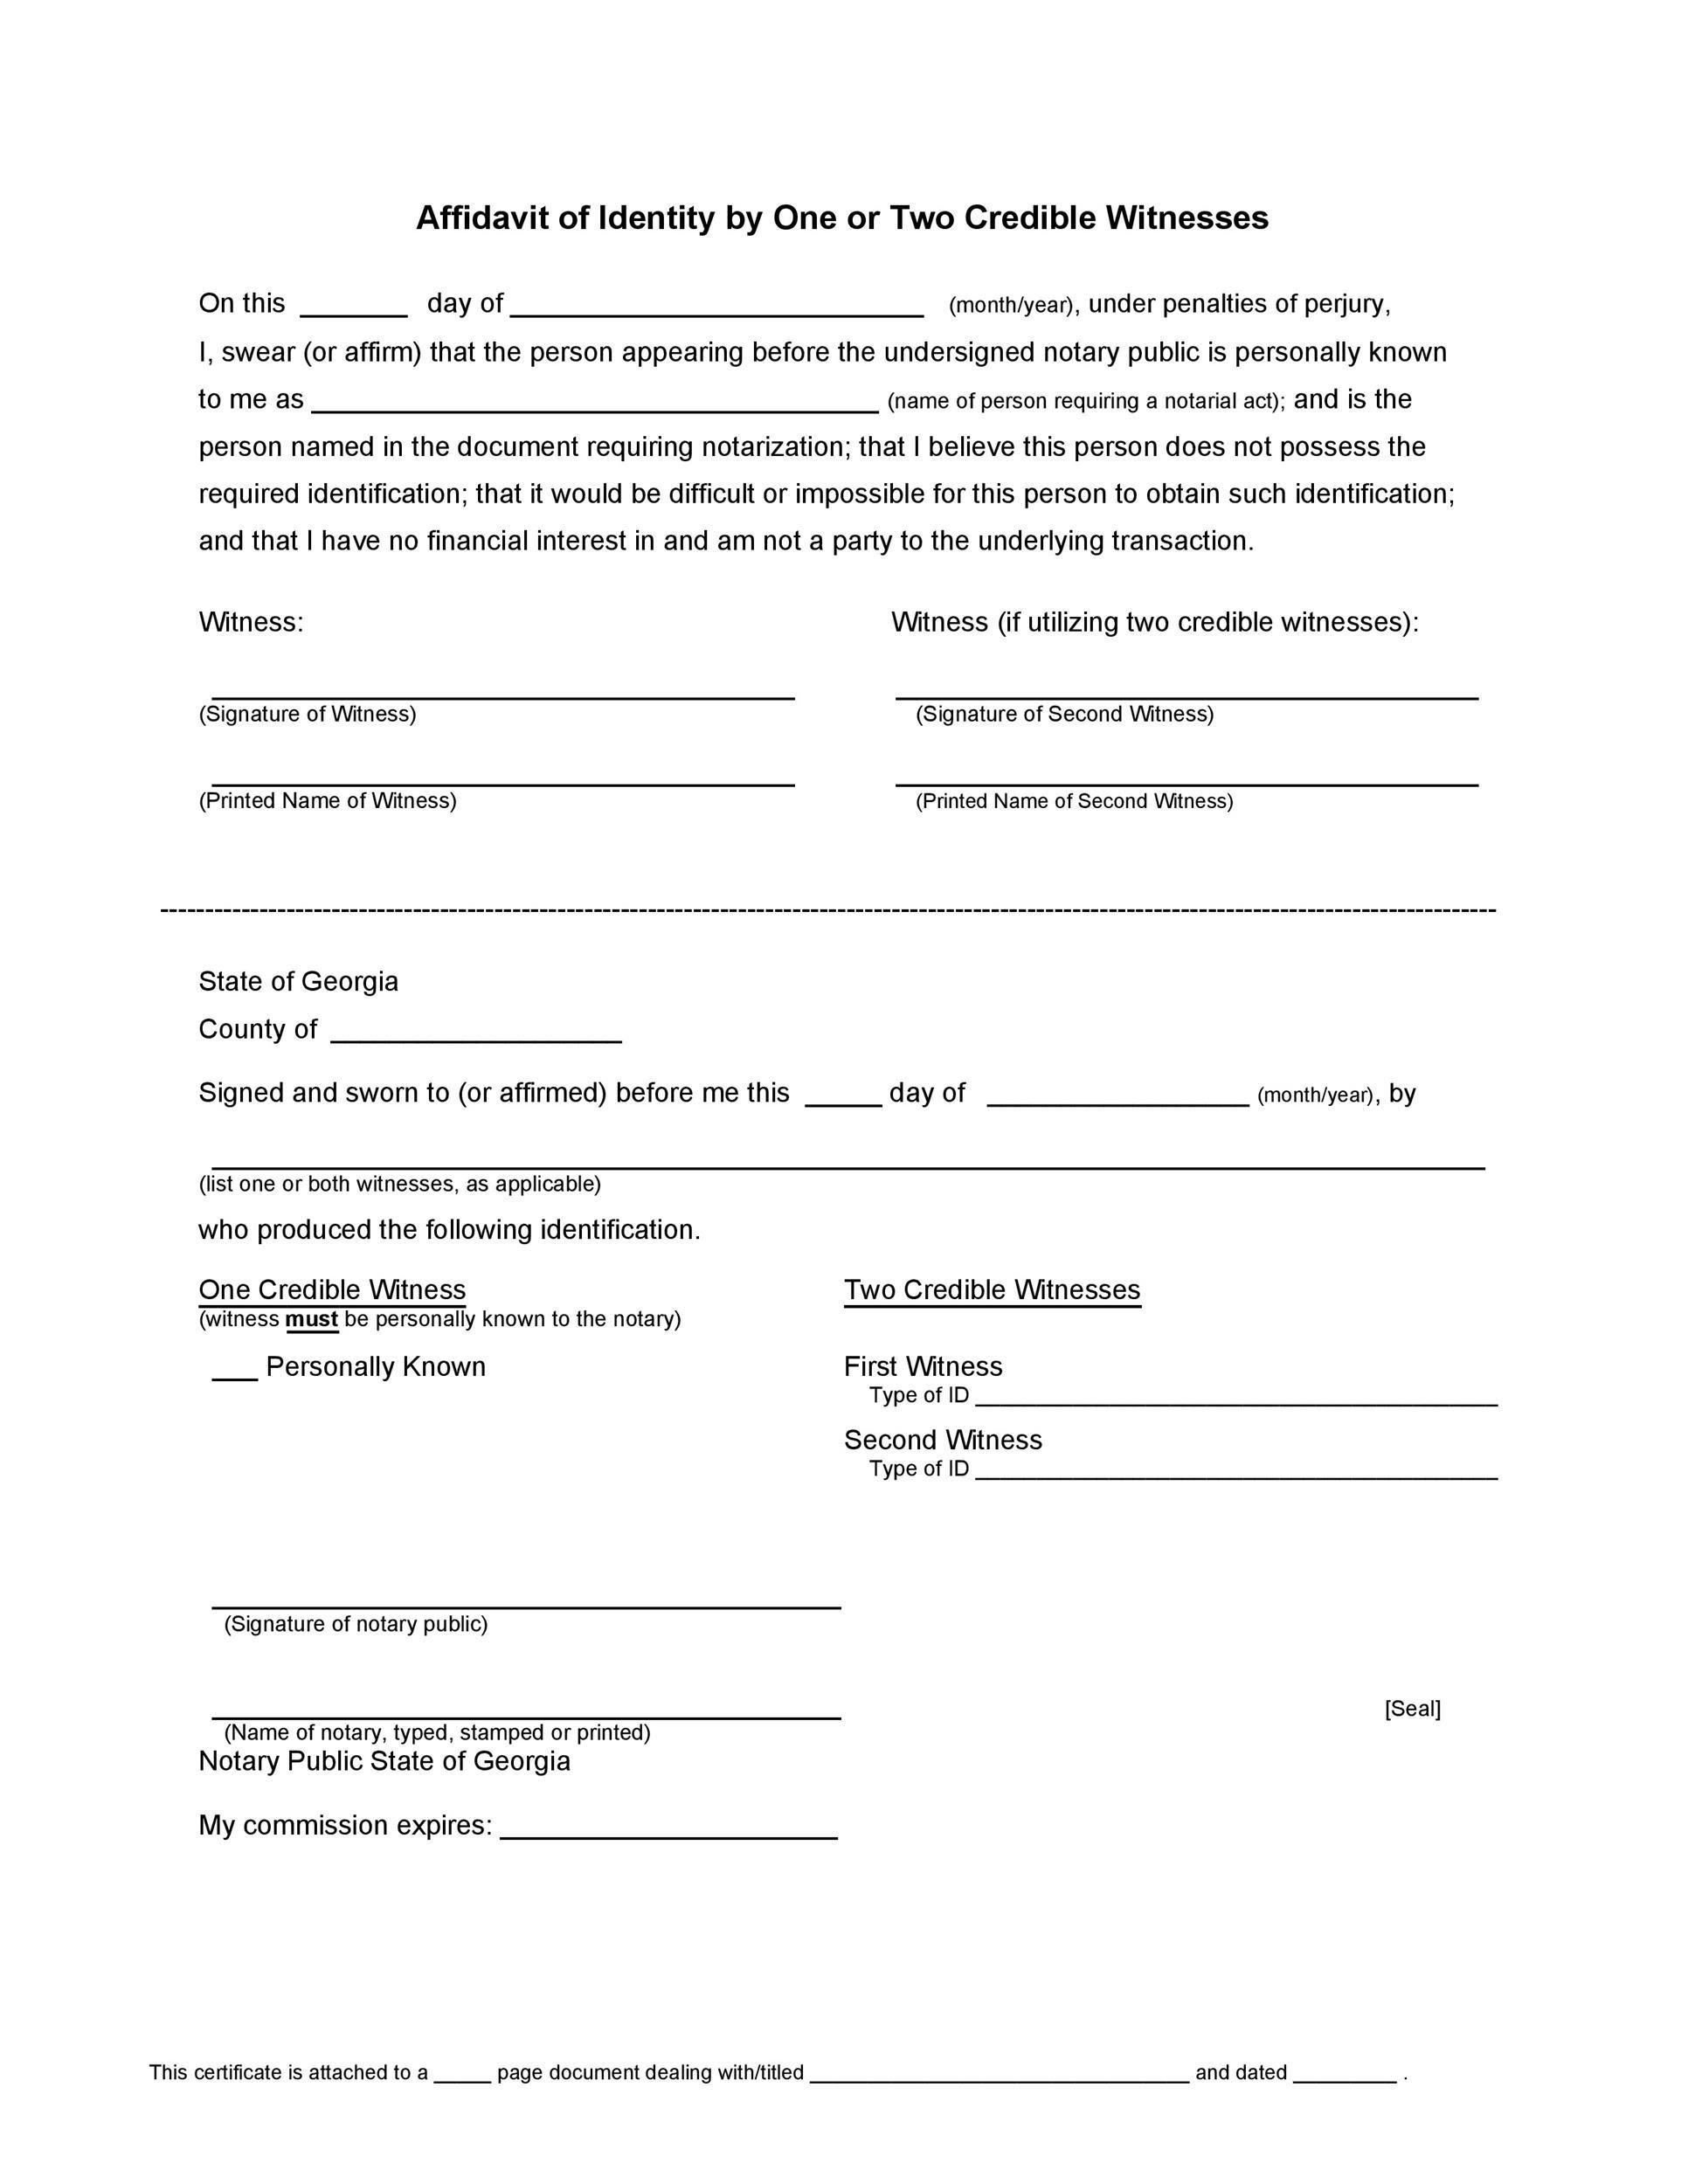 Affidavit Of Testimony Sample  Master of Template Document